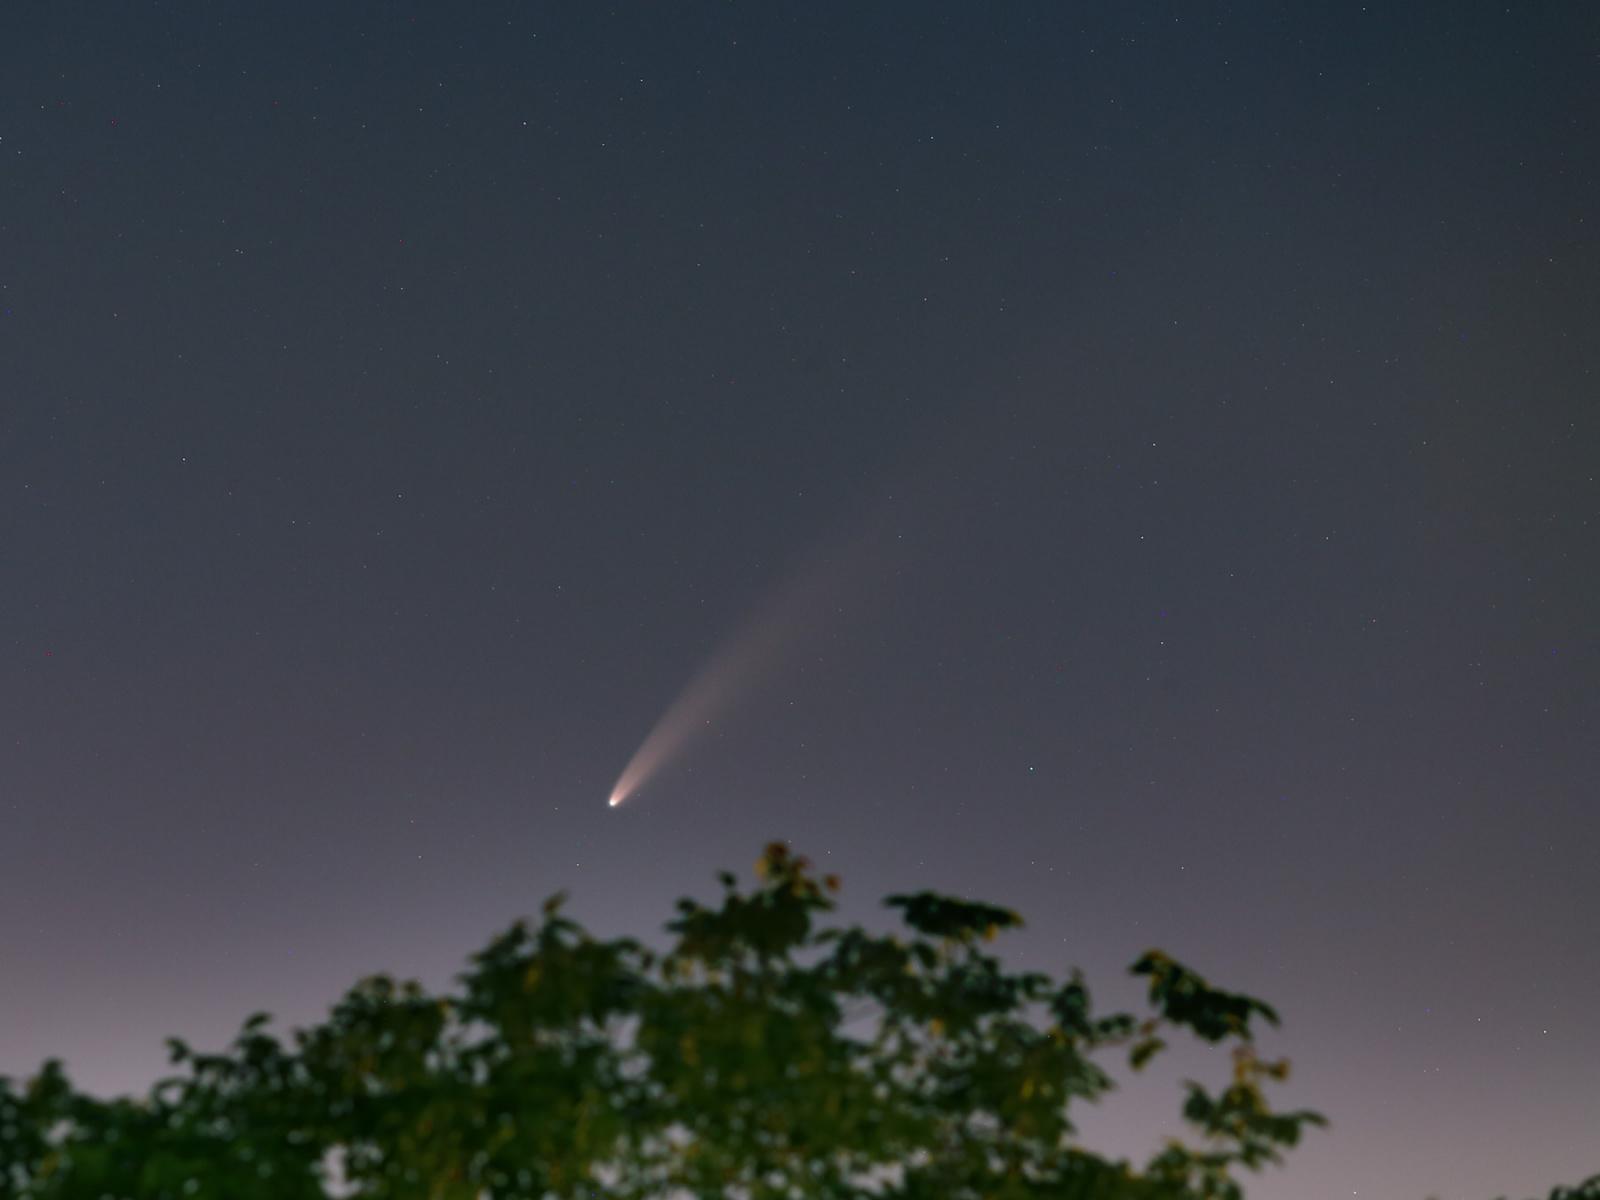 Kometa_F3Neowise_20200713_2235_200mm_f3.5_5s.jpg